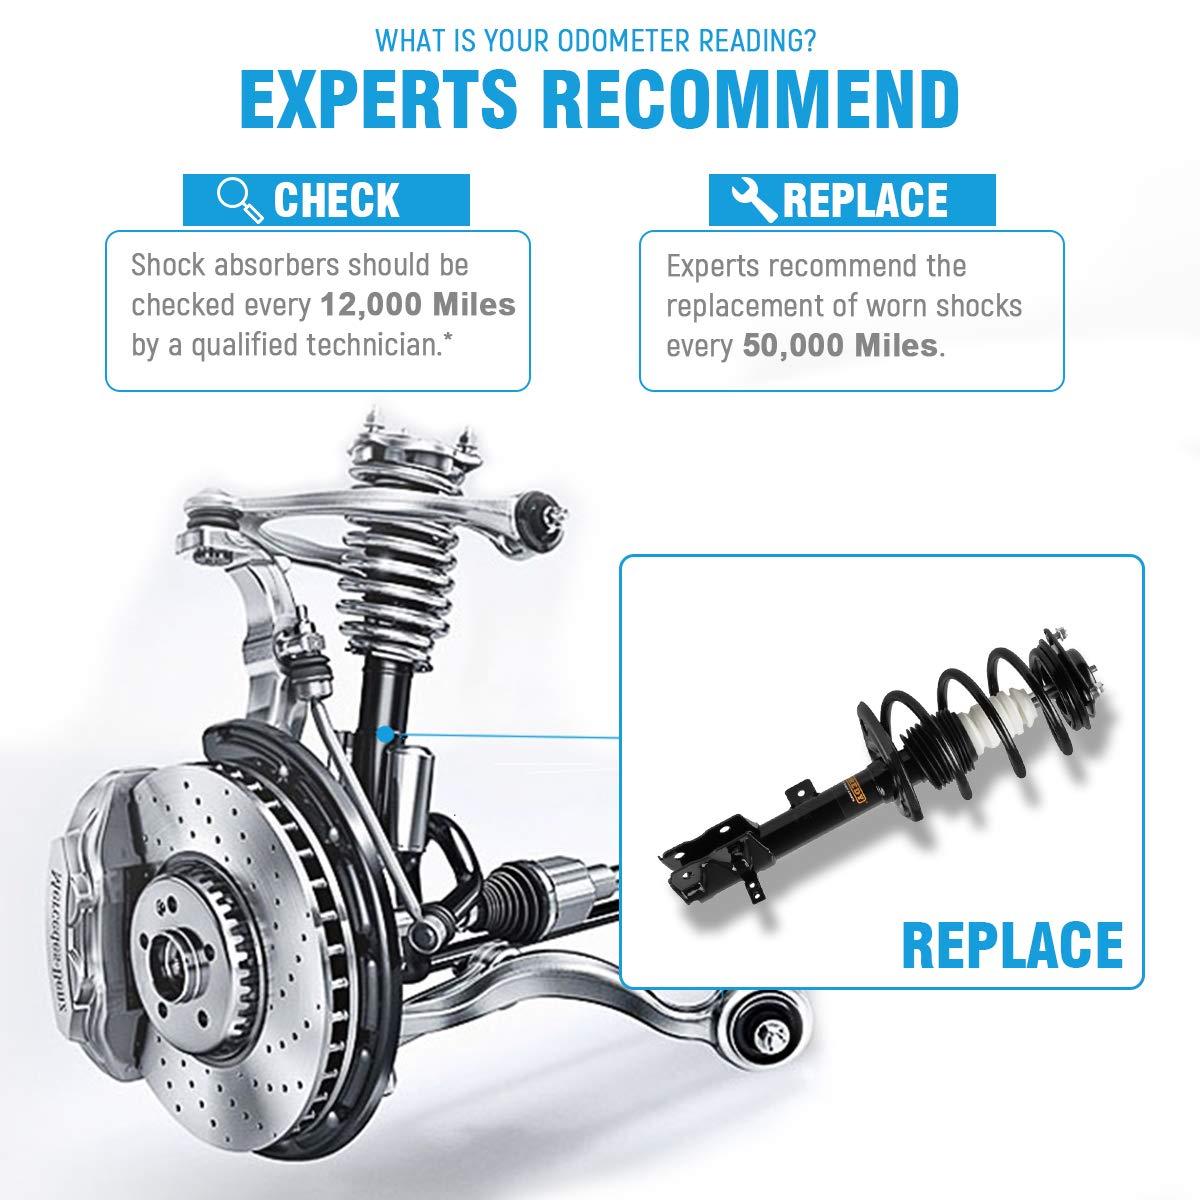 Fits: 2007 07 2008 08 2009 09 2011 11 2012 12 Kia Rondo Max Brakes Front Premium Brake Kit OE Series Rotors + Metallic Pads TA043841